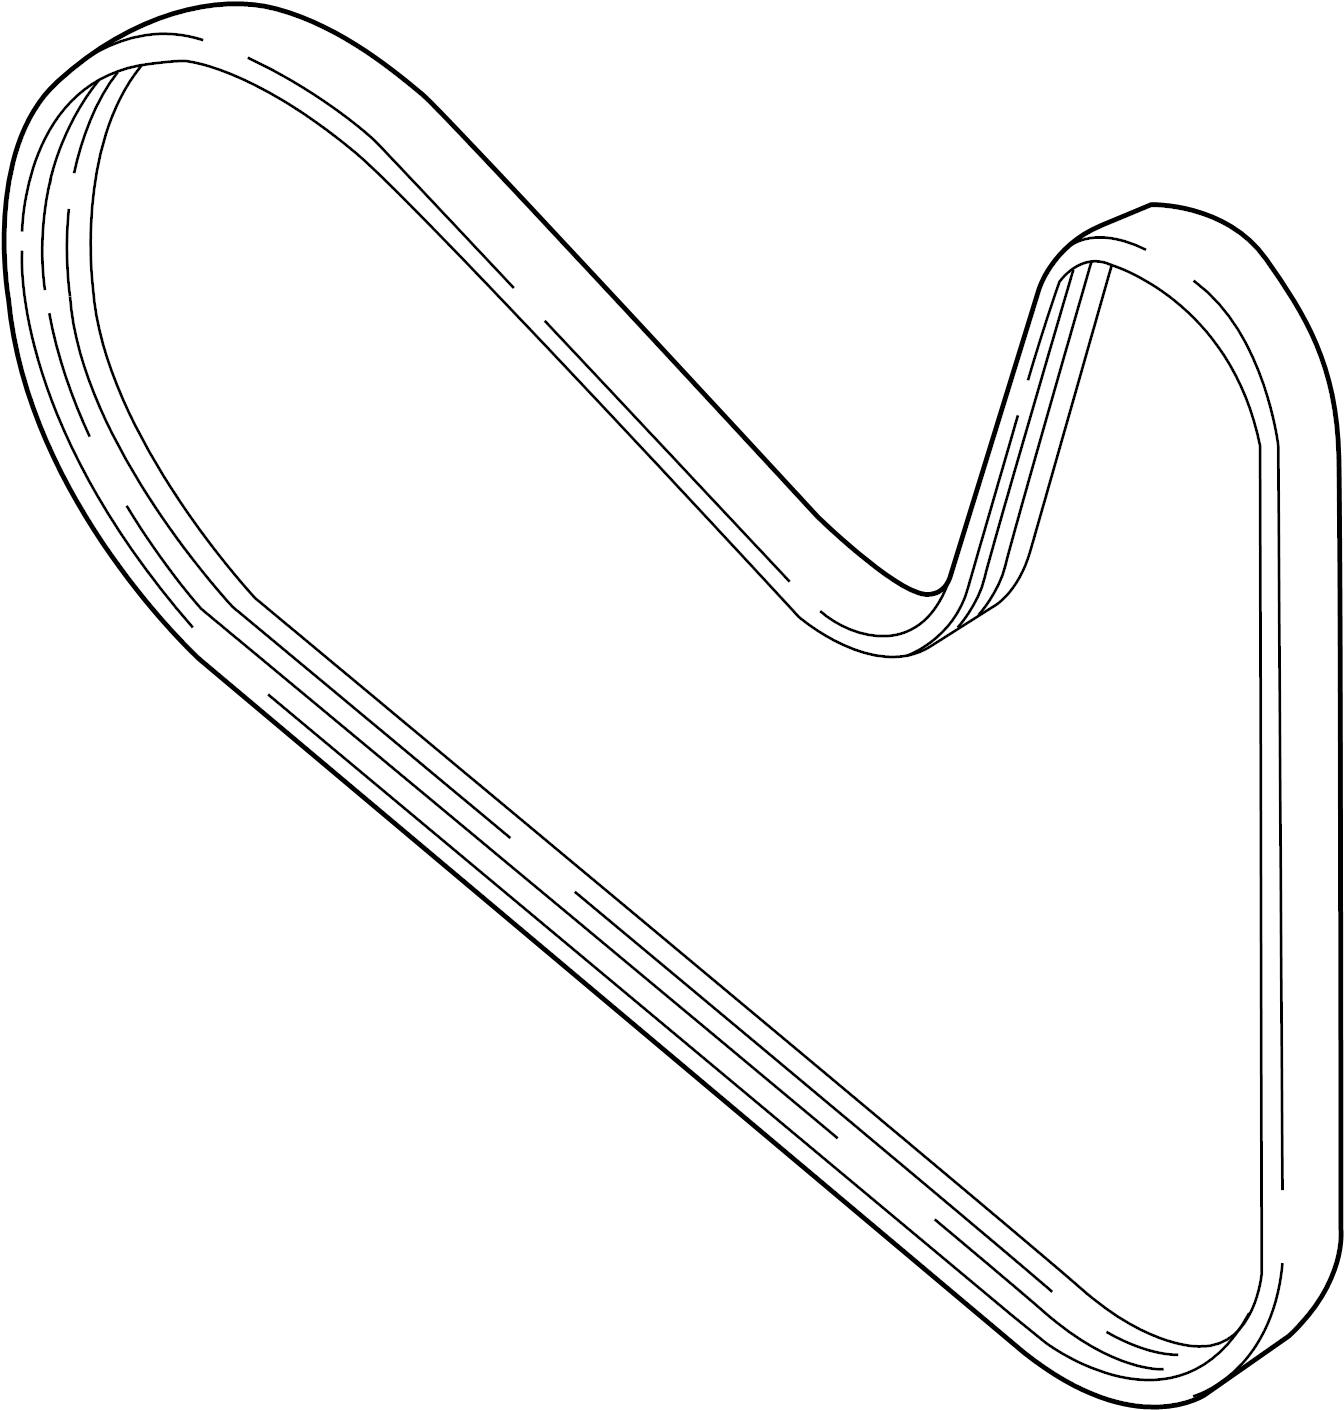 2015 Volkswagen Beetle Ribbedbelt. Serpentine belt. 2.0